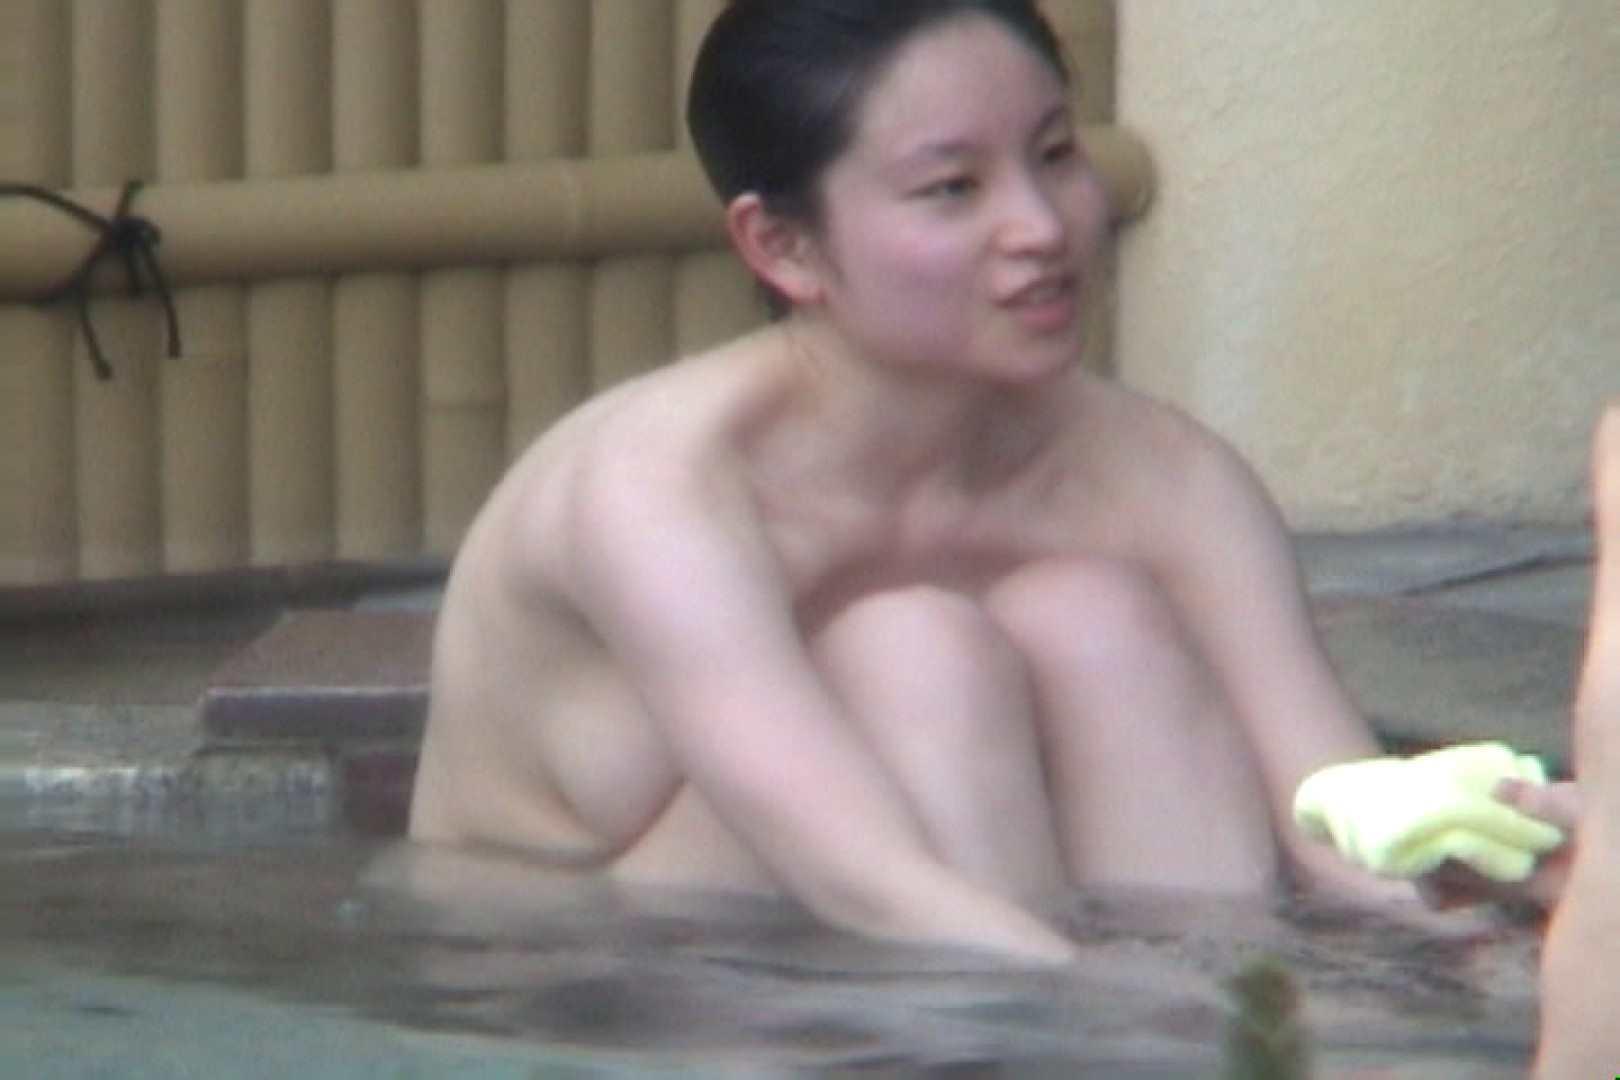 Aquaな露天風呂Vol.45【VIP限定】 HなOL   盗撮  100pic 90